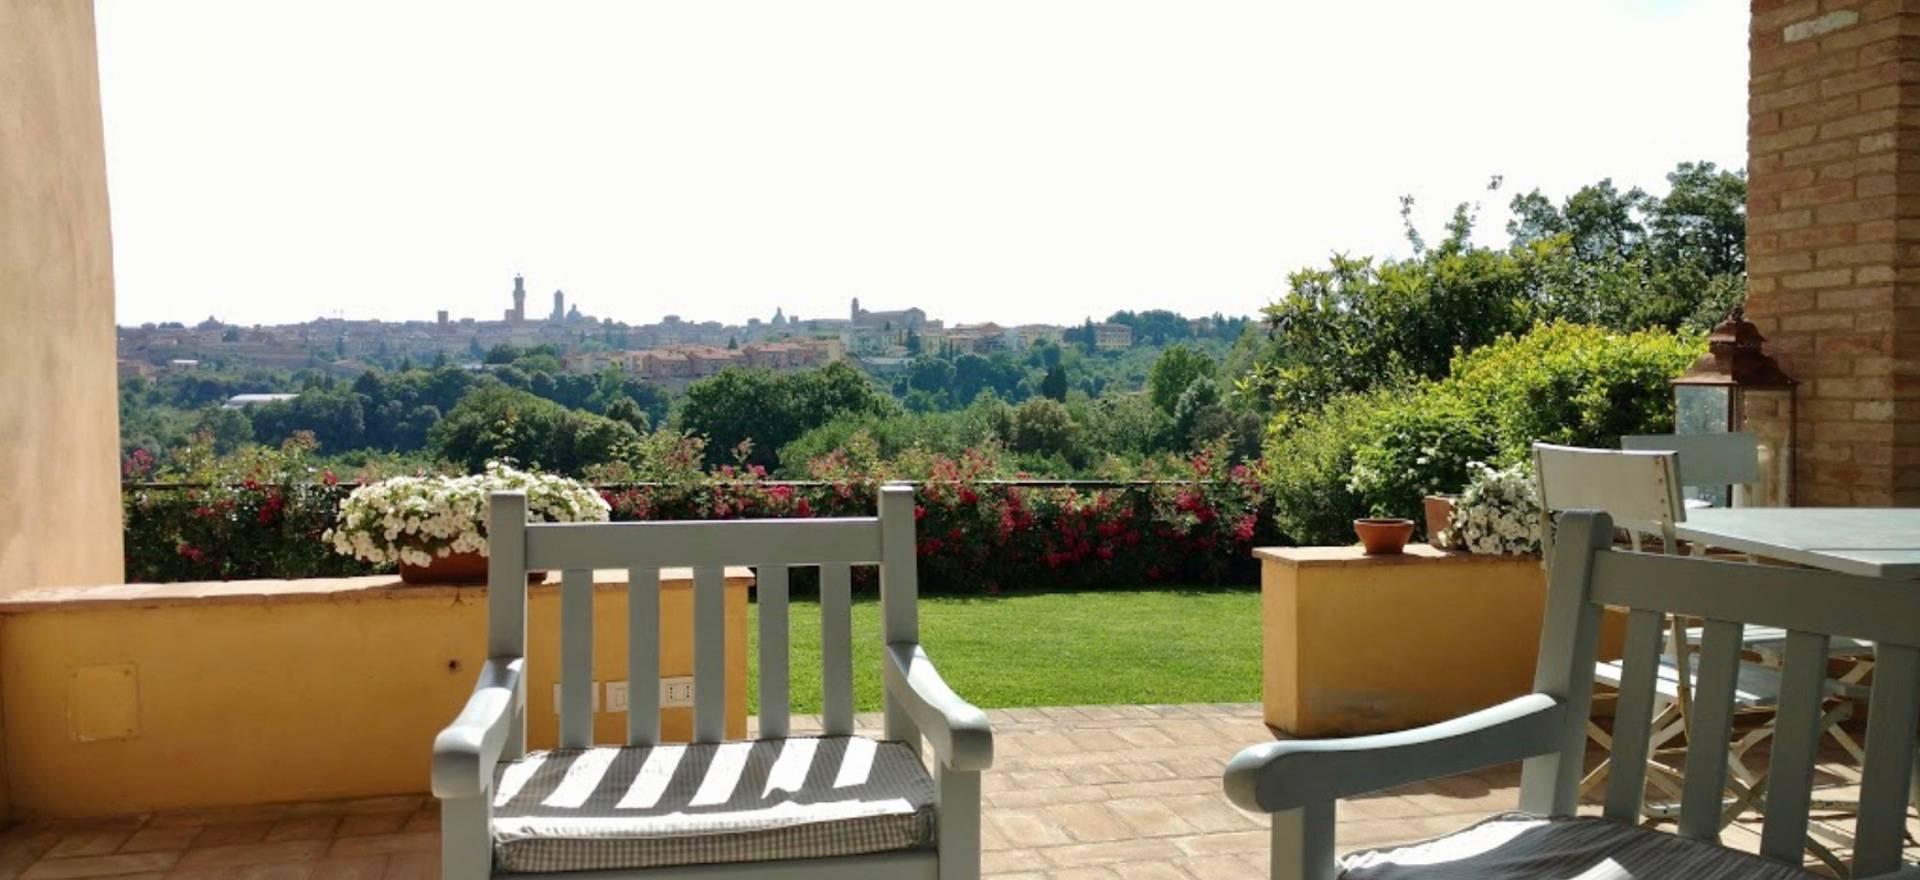 Agriturismo Toscana Agriturismo elegante con bella vista su Siena